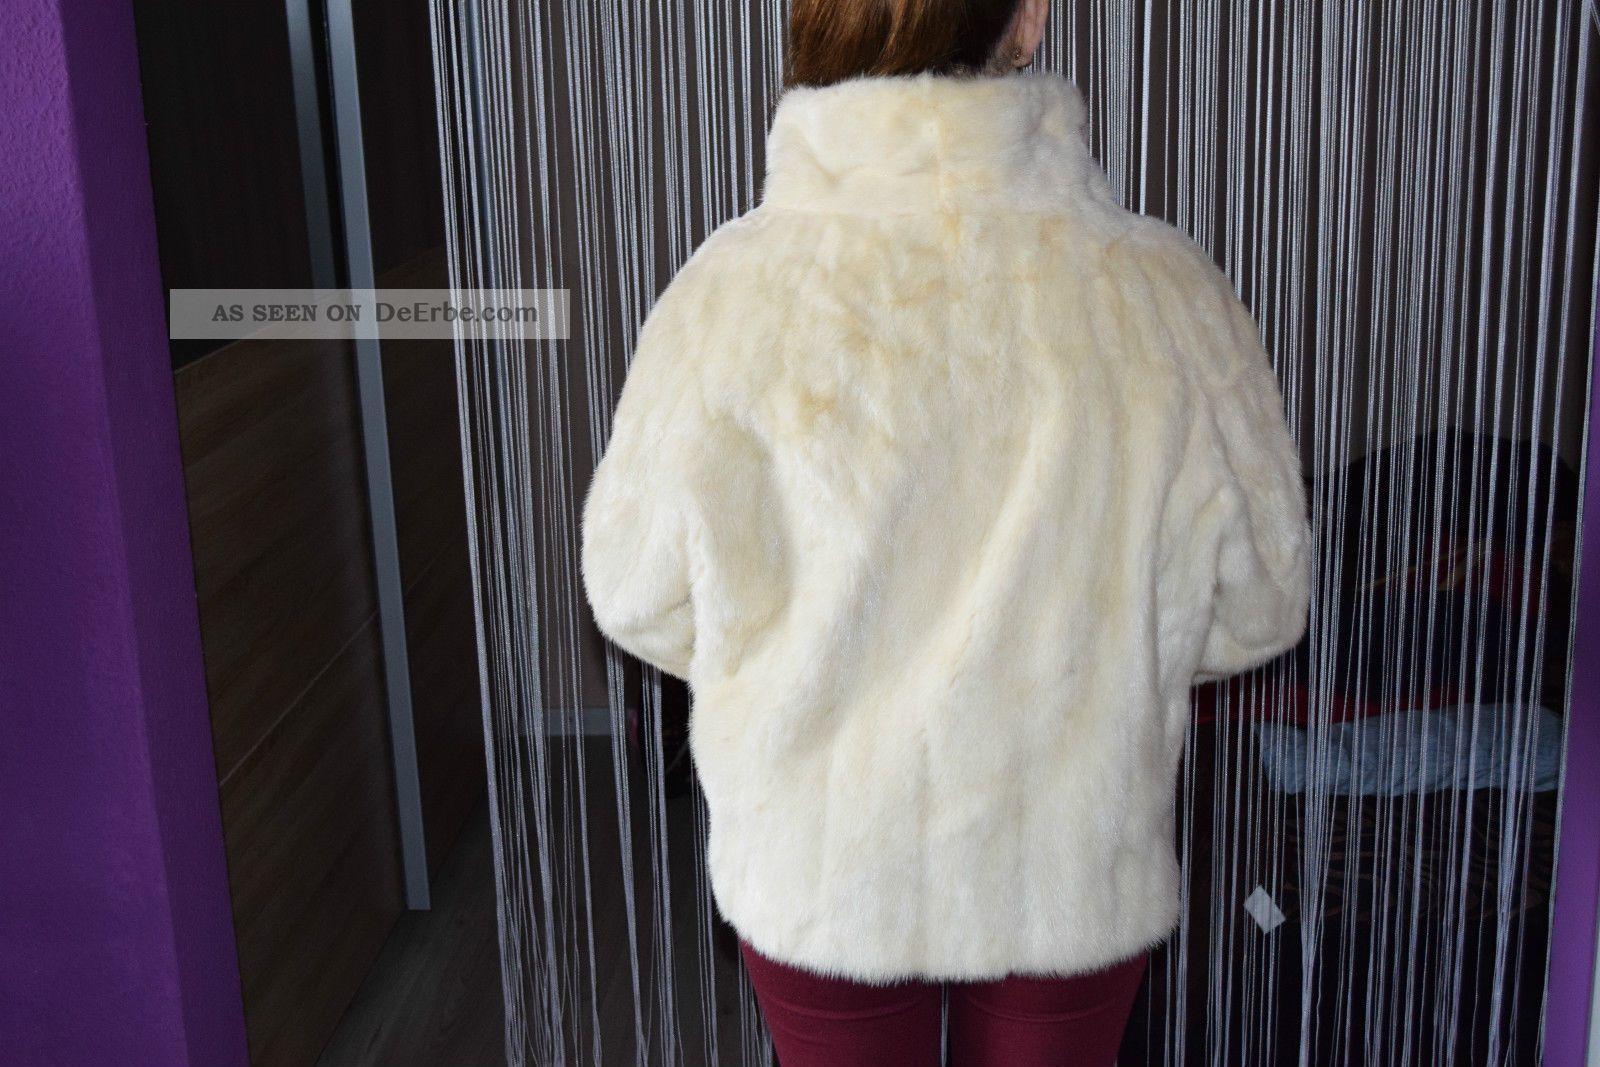 nerz pelz damen winter mantel jacke poncho parka wei creme. Black Bedroom Furniture Sets. Home Design Ideas